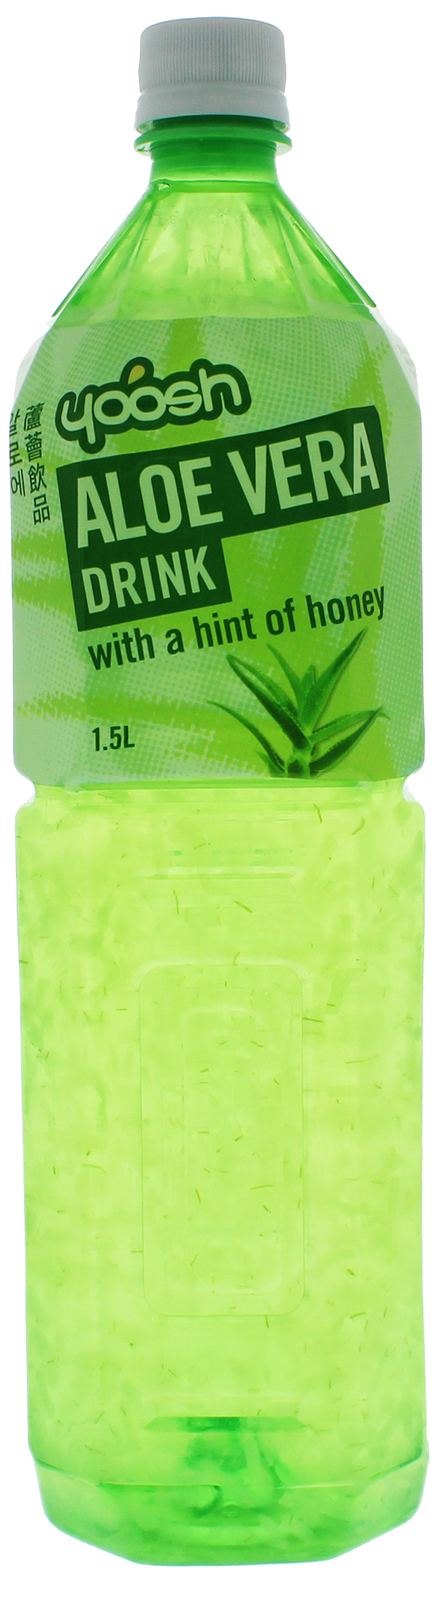 Yoosh Aloe Vera Drink 1.5L image